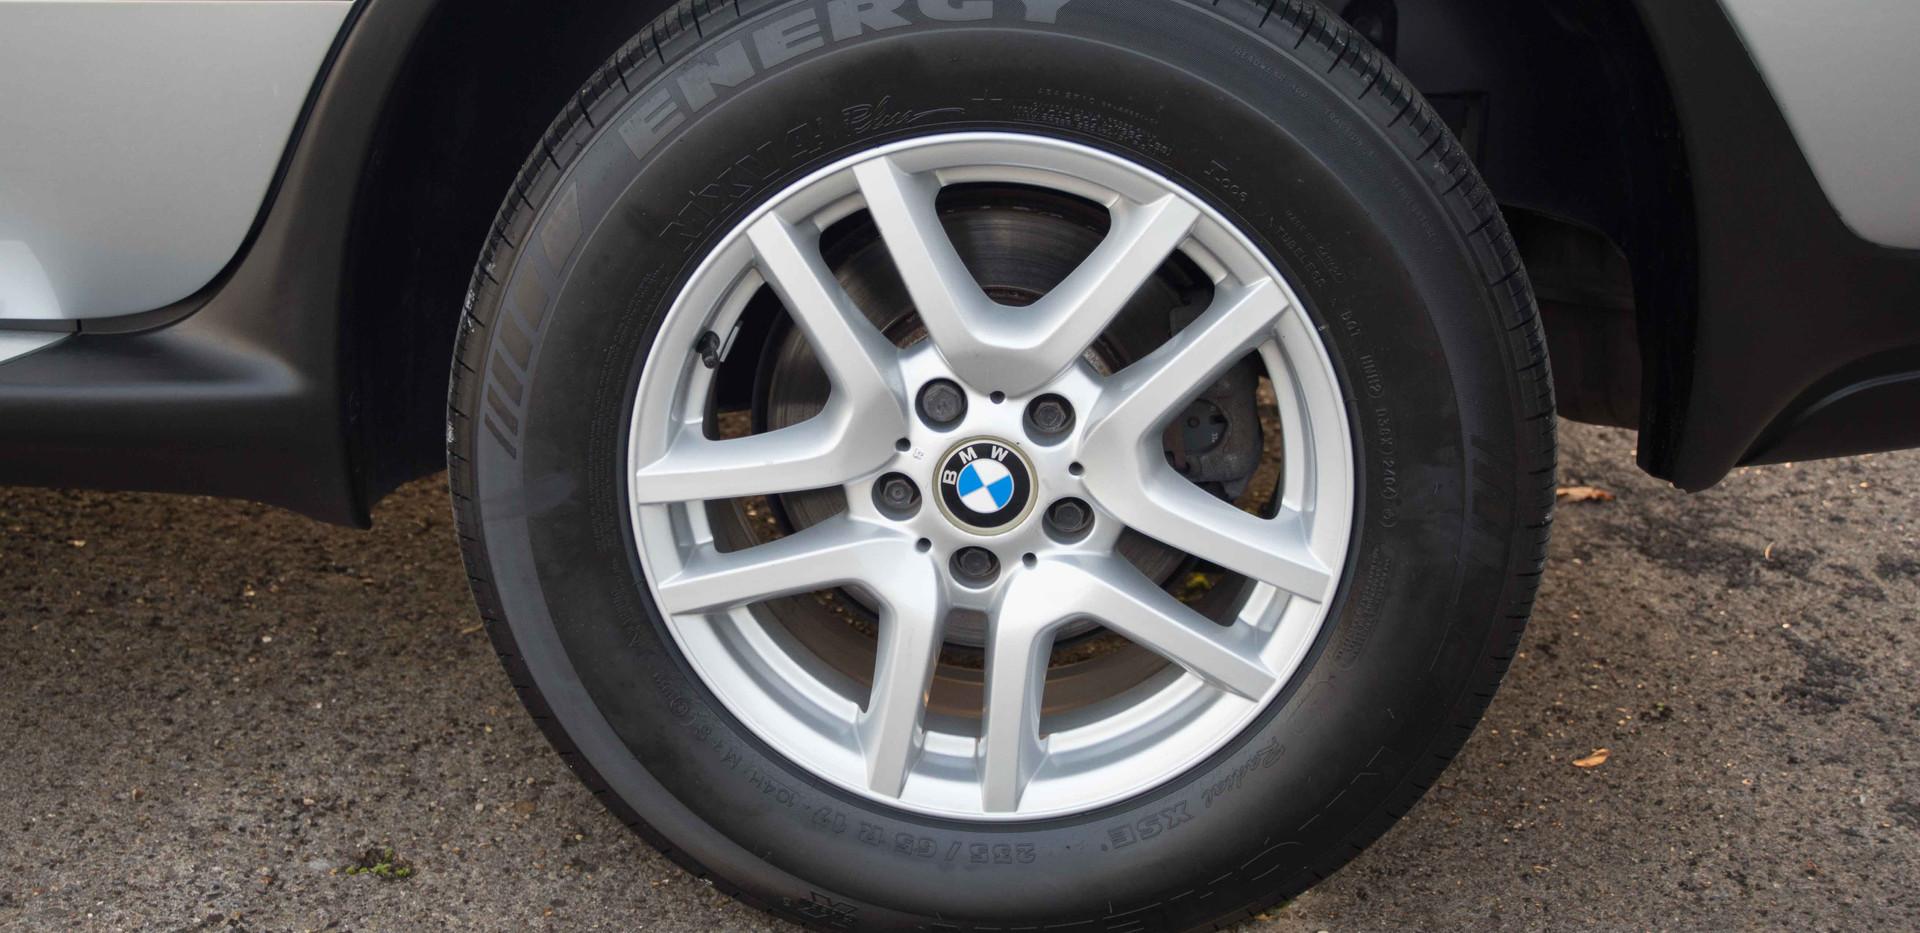 BMW E53 X5 4.4i For Sale UK London  (26